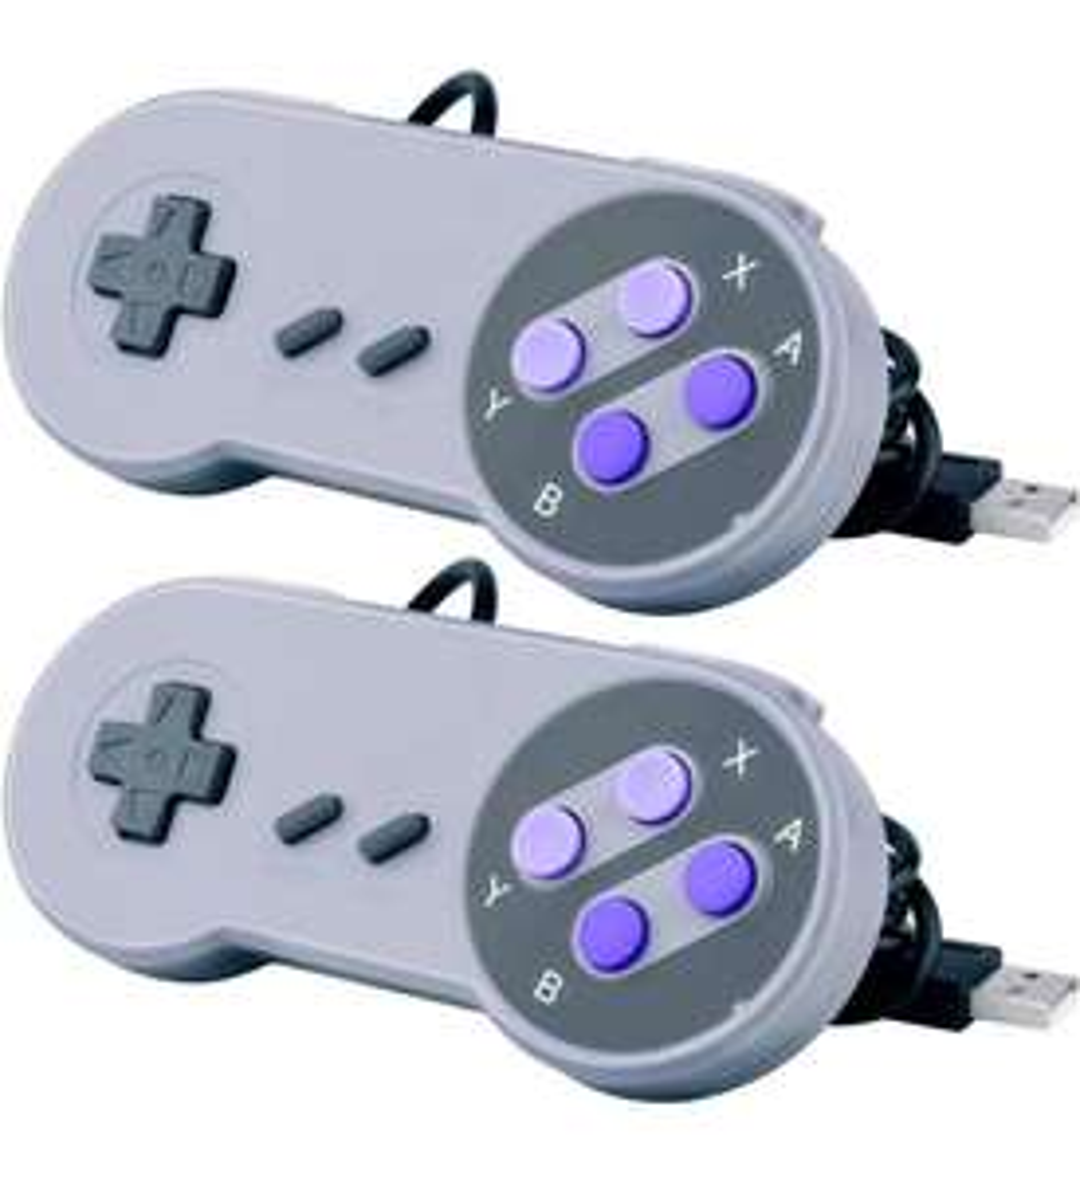 Amazon: Paquete de 2 controles para NES y SNES Classic/PC/Mac/Rapsberri Pi